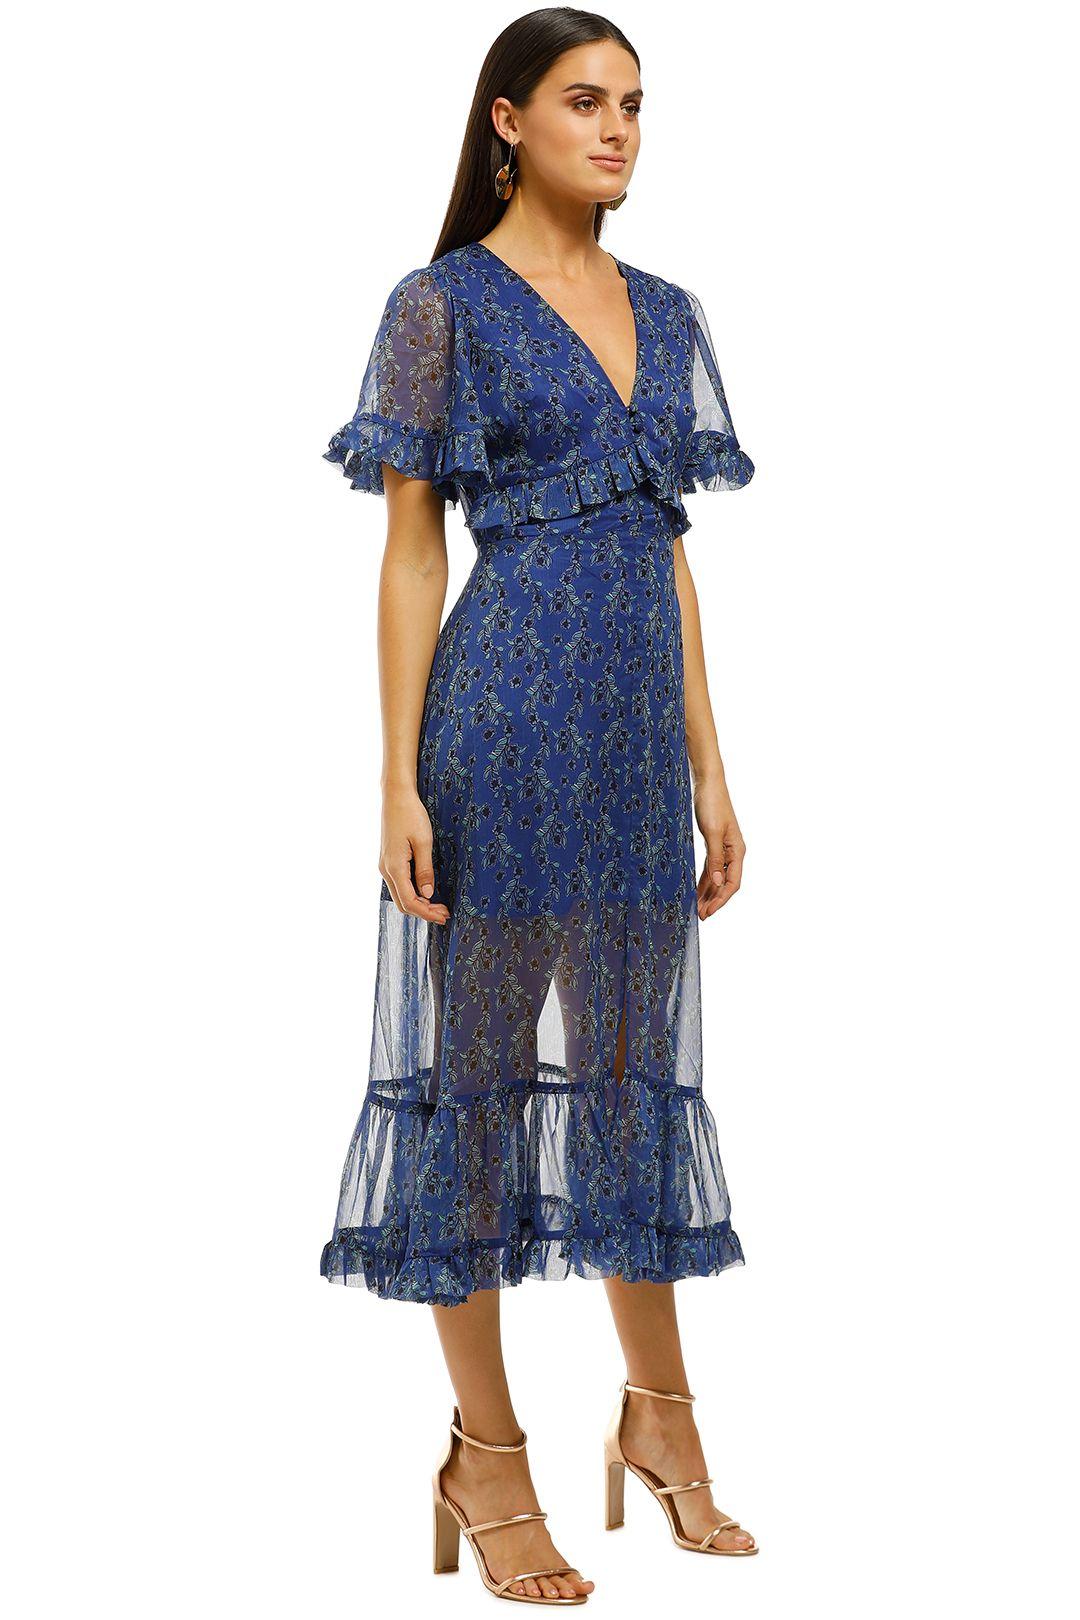 Talulah-Morning-Light-Midi-Dress-Blue-Side